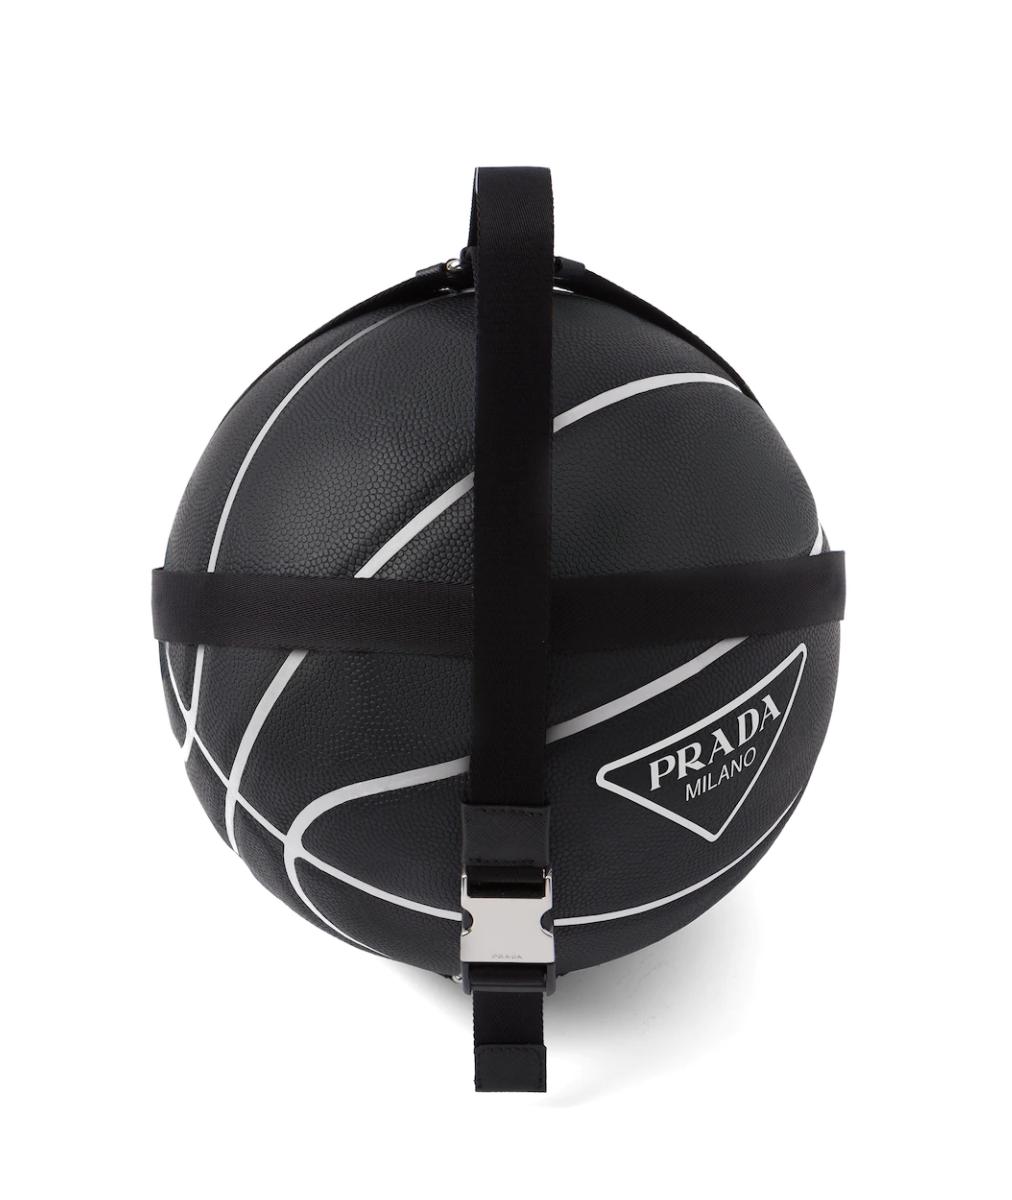 Arnés de baloncesto de Prada